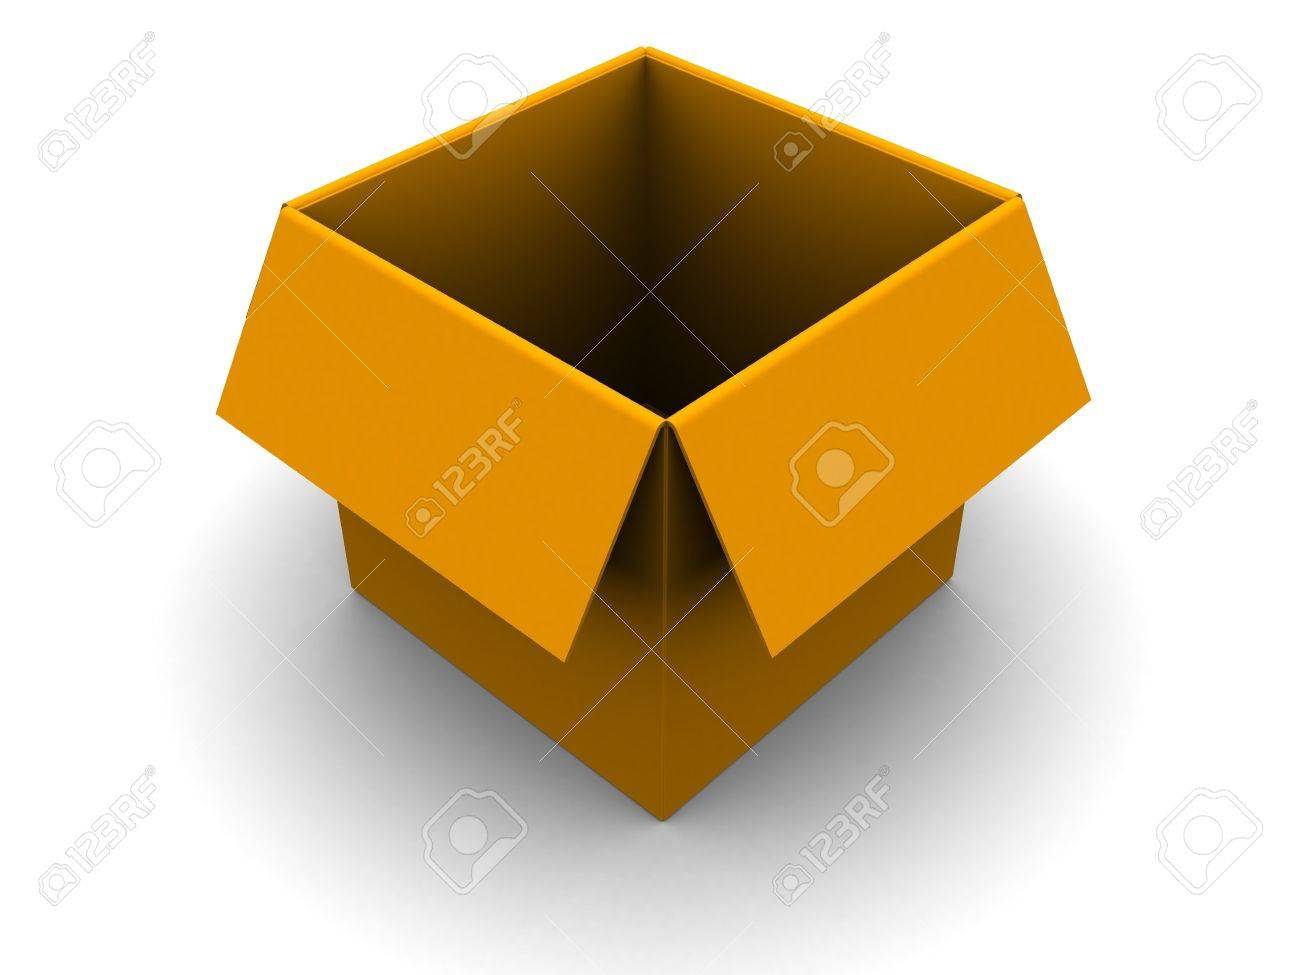 3d illustration of empty orange box over white background Stock Photo - 5023080